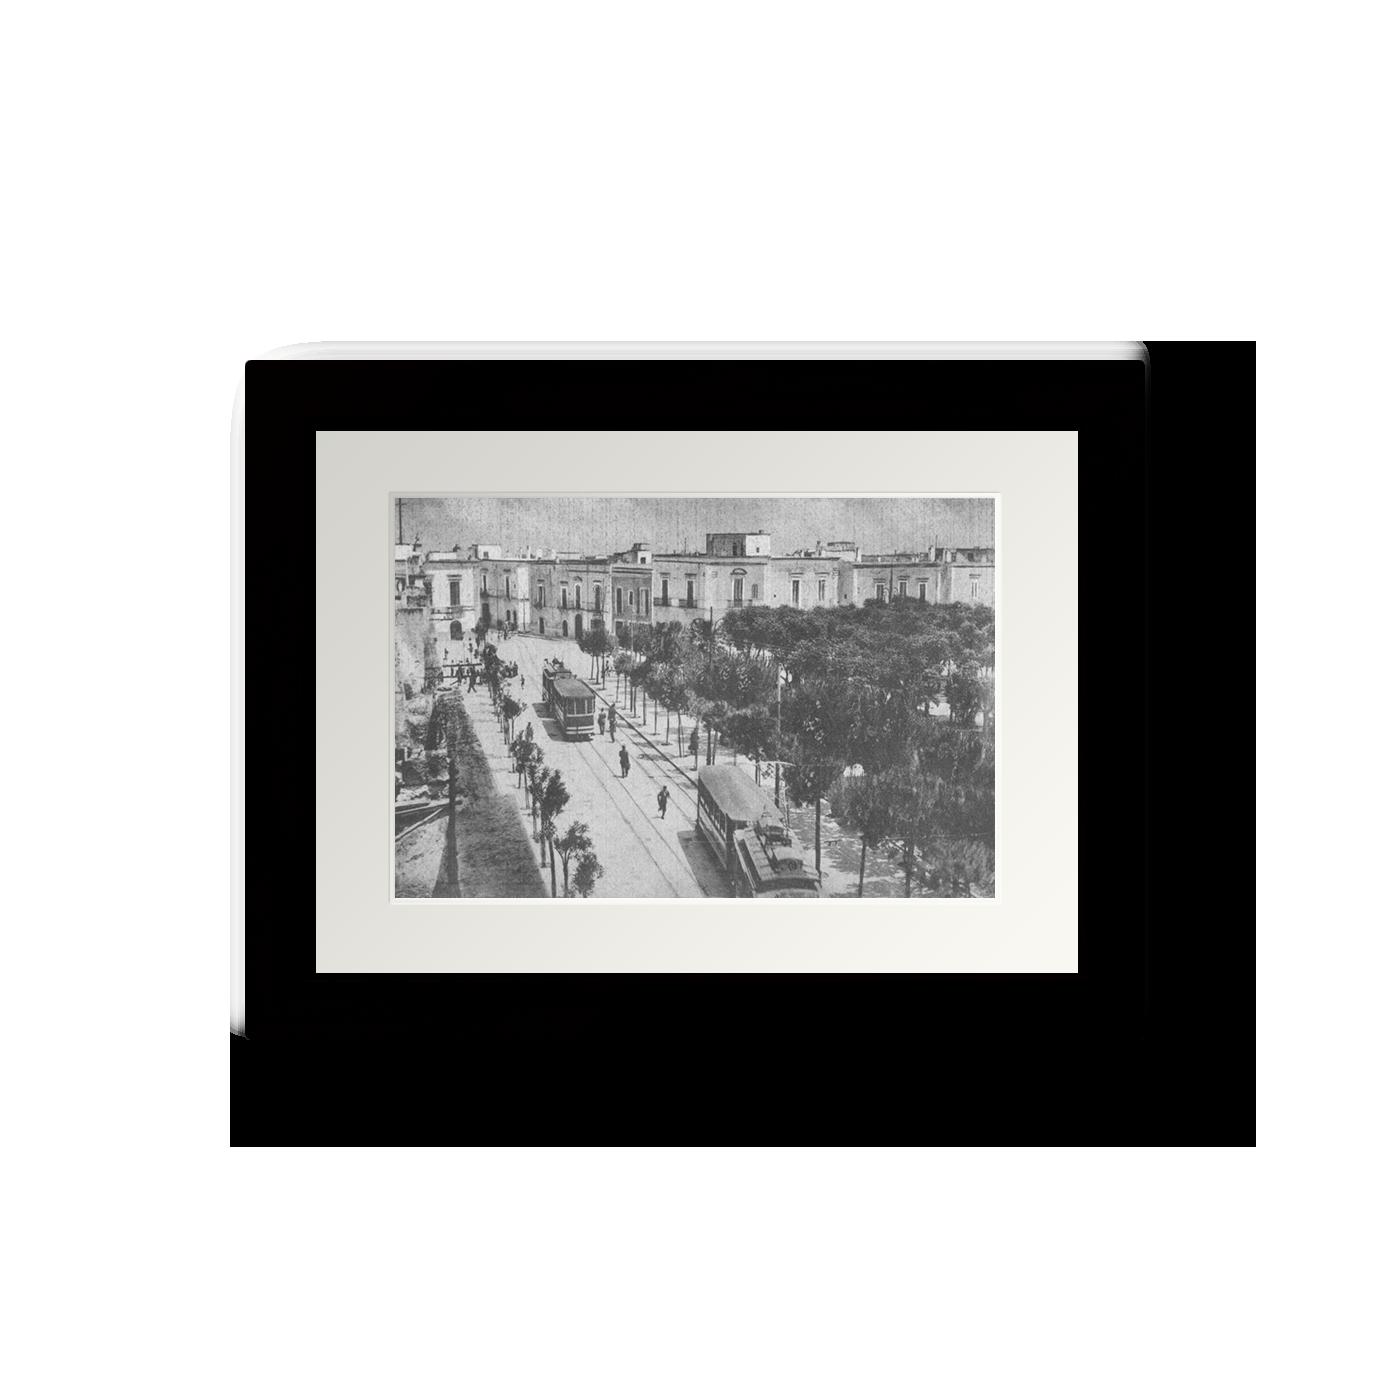 Carbonara Di Bari Storia (bari ) carbonara di bari - 1930